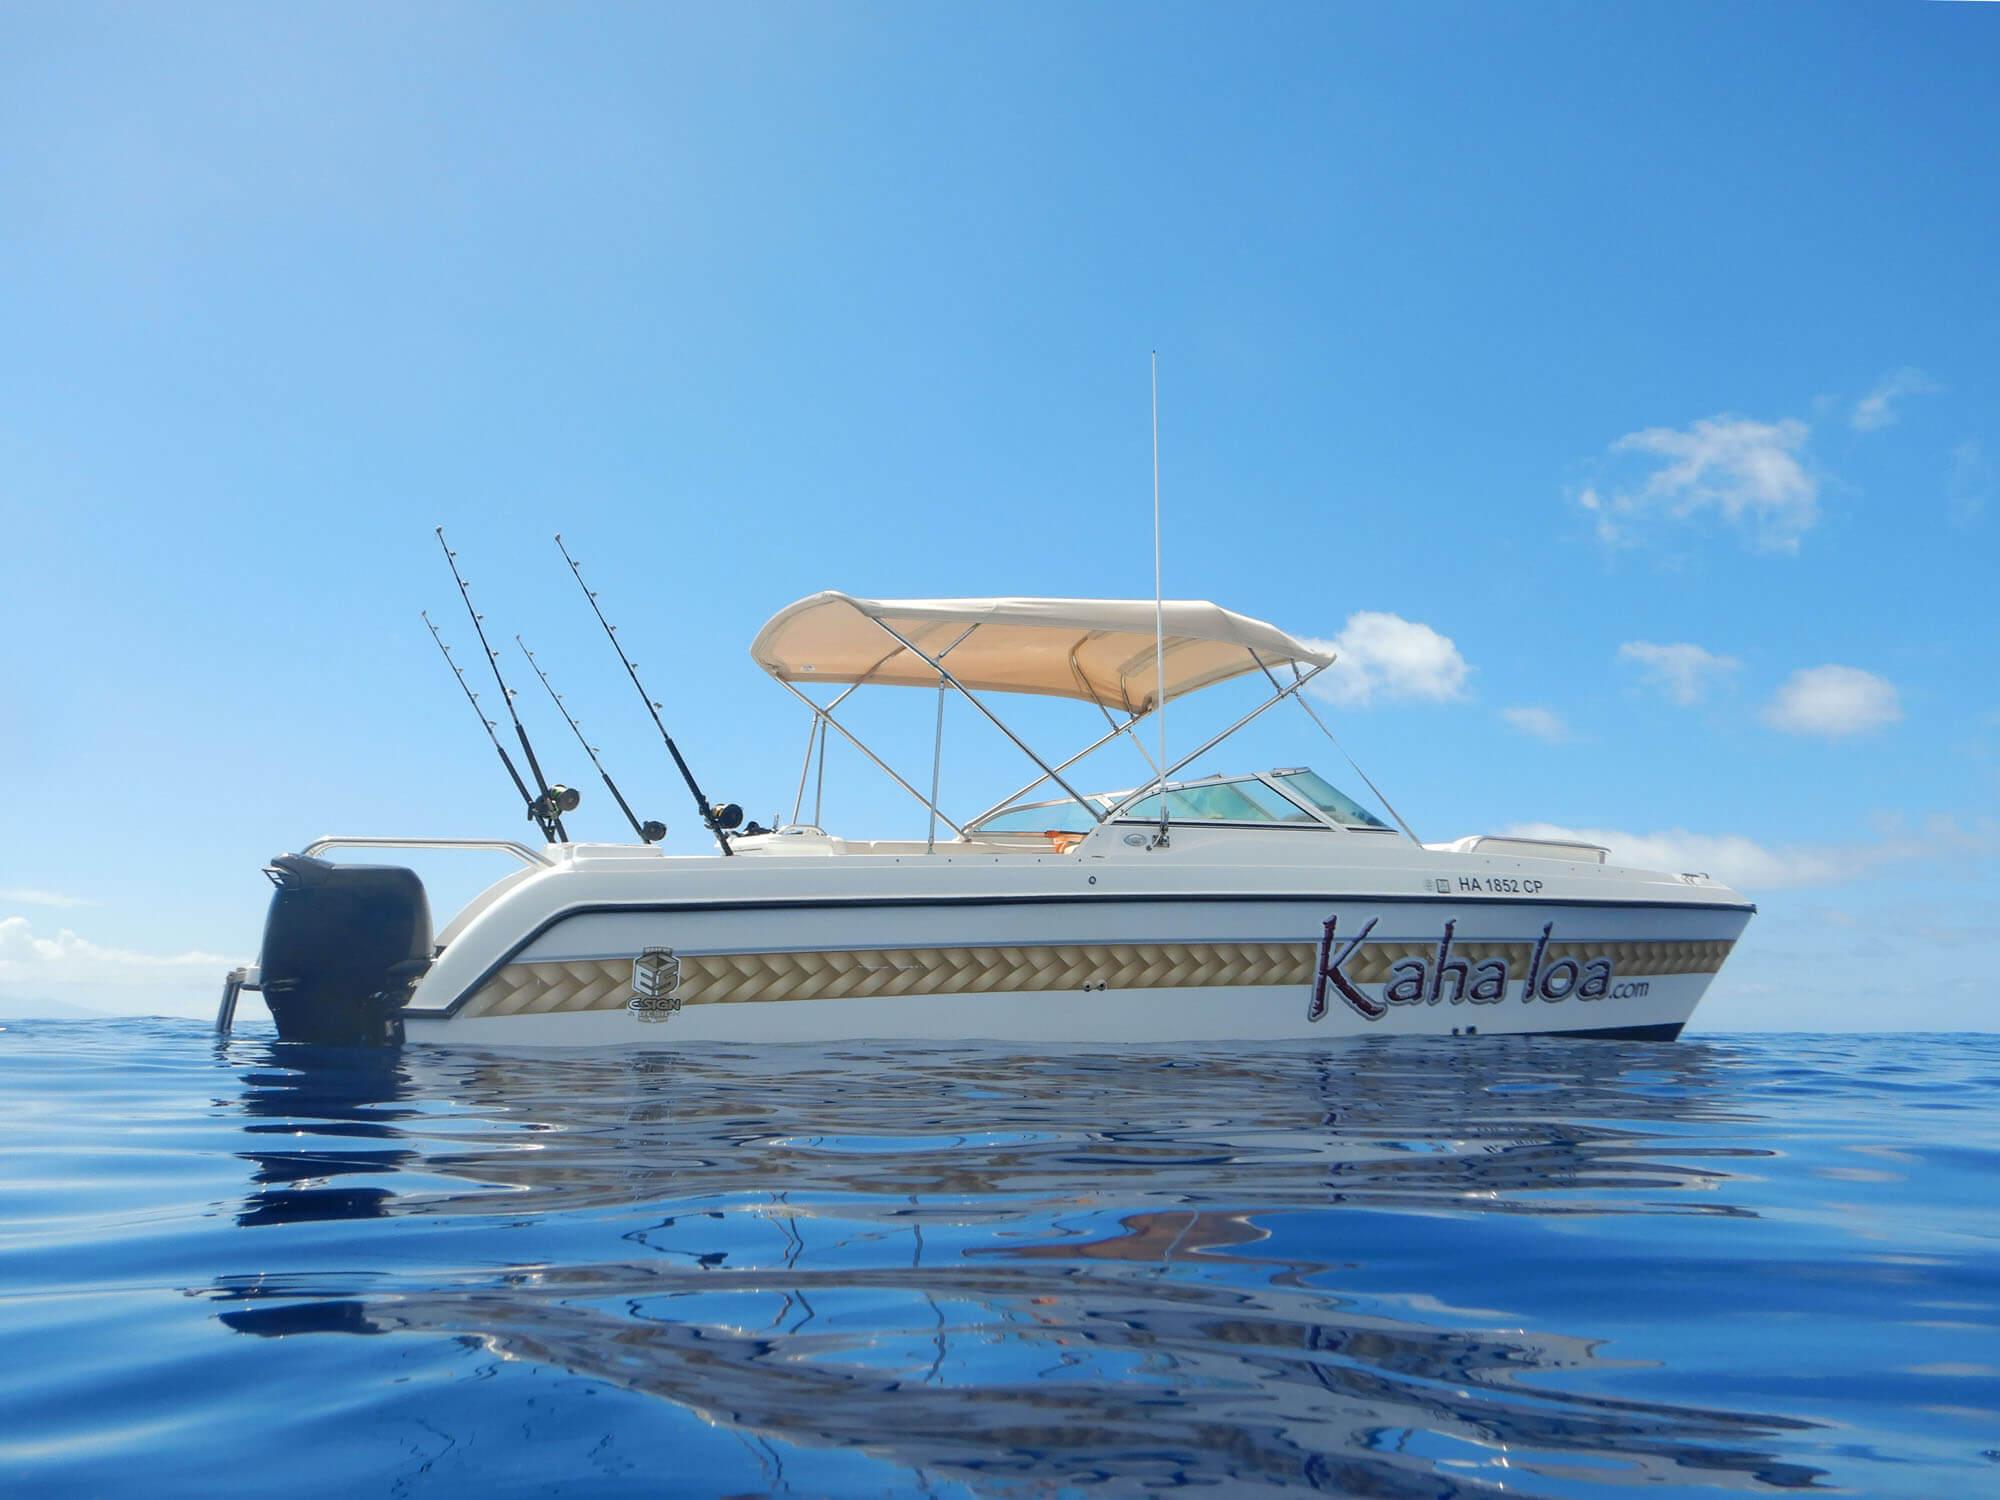 Private 6 Passenger Charter Boat